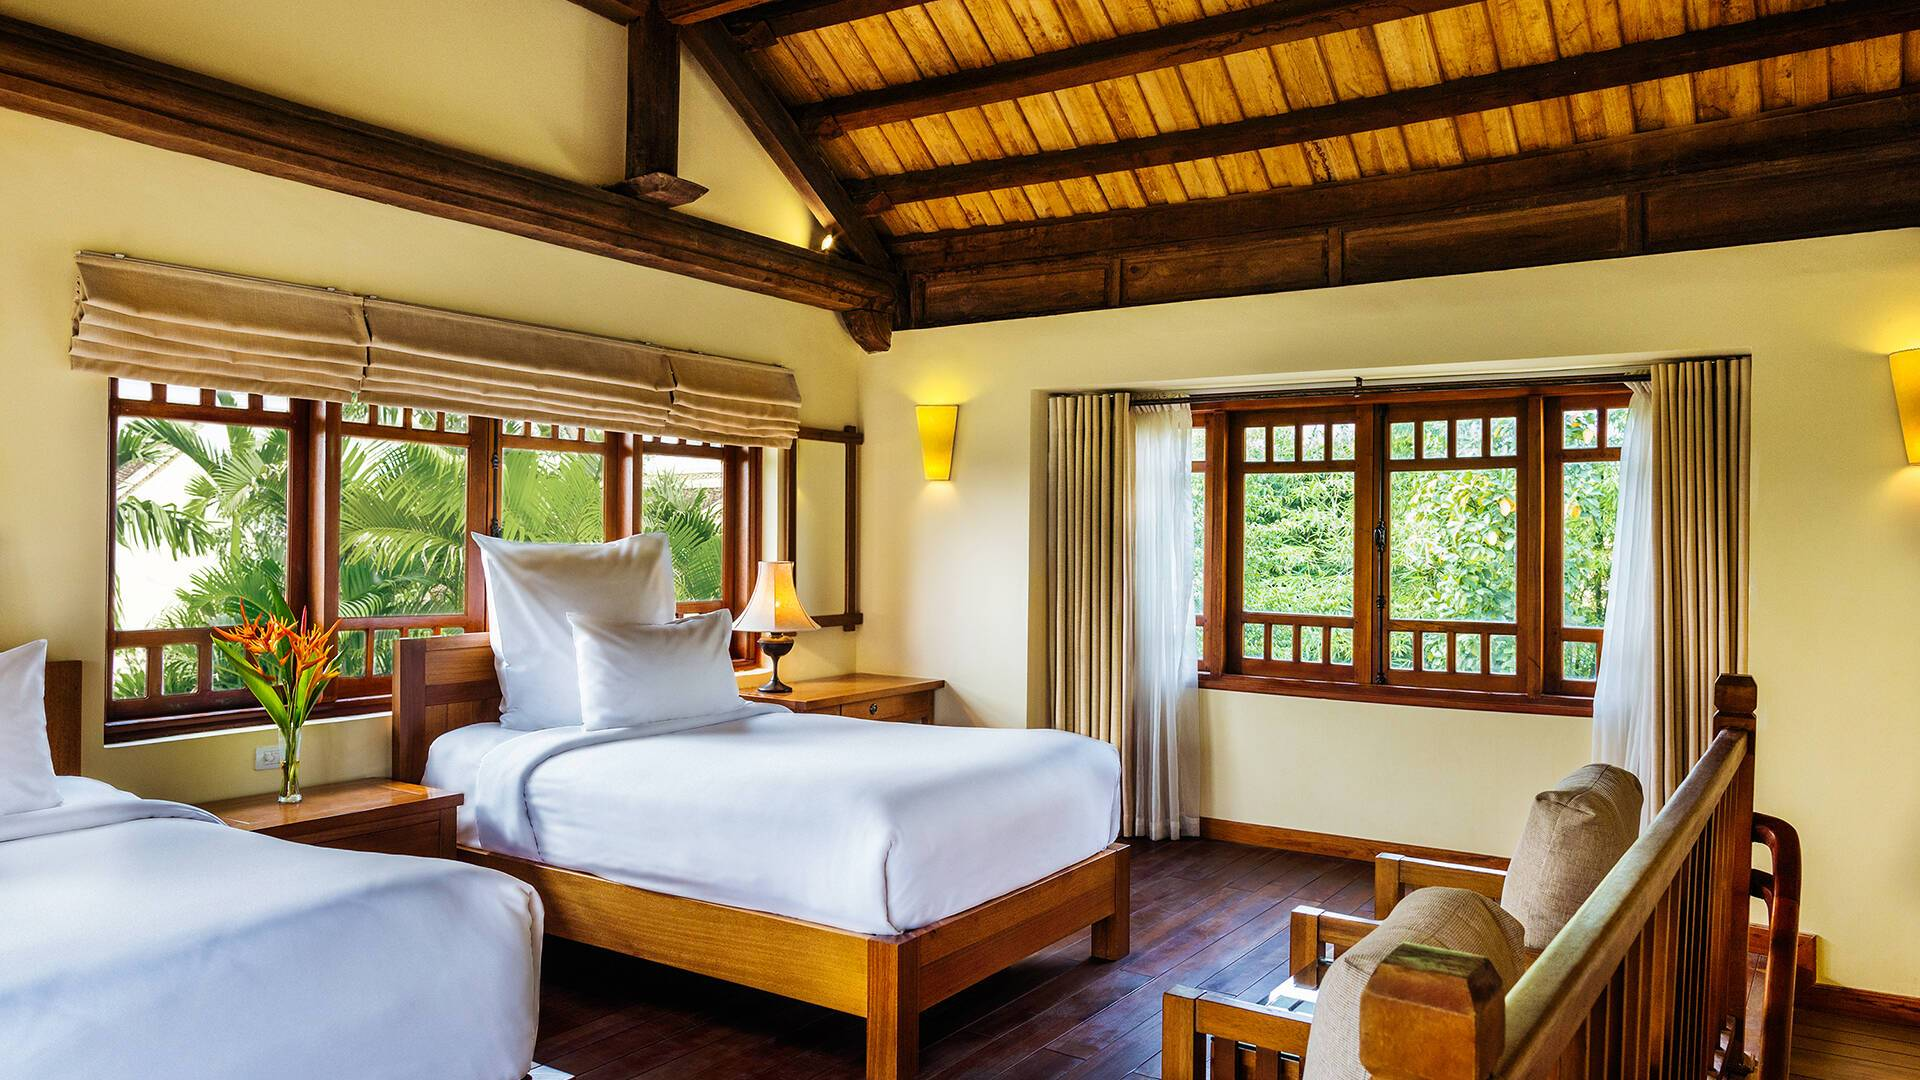 Vietnam Emeralda Resort Chambre Ninh Binh